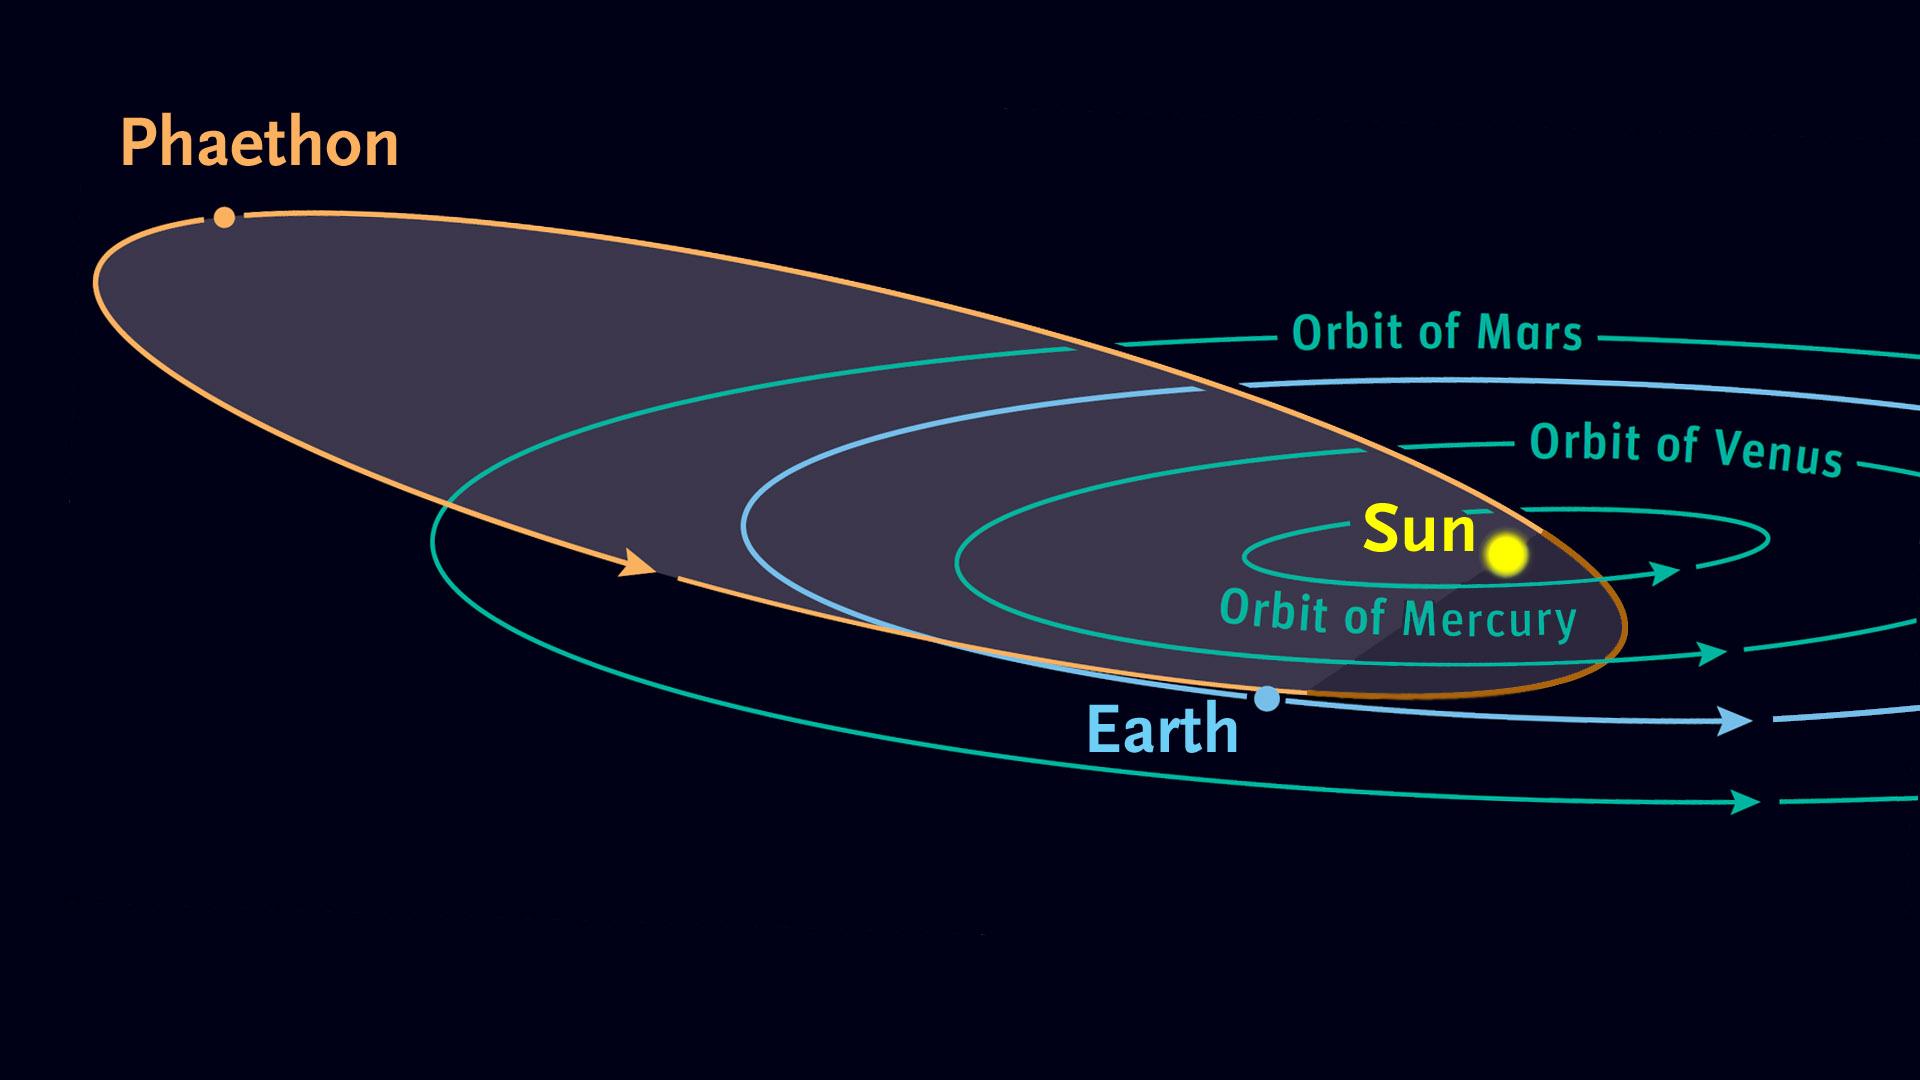 Фаэтон орбита